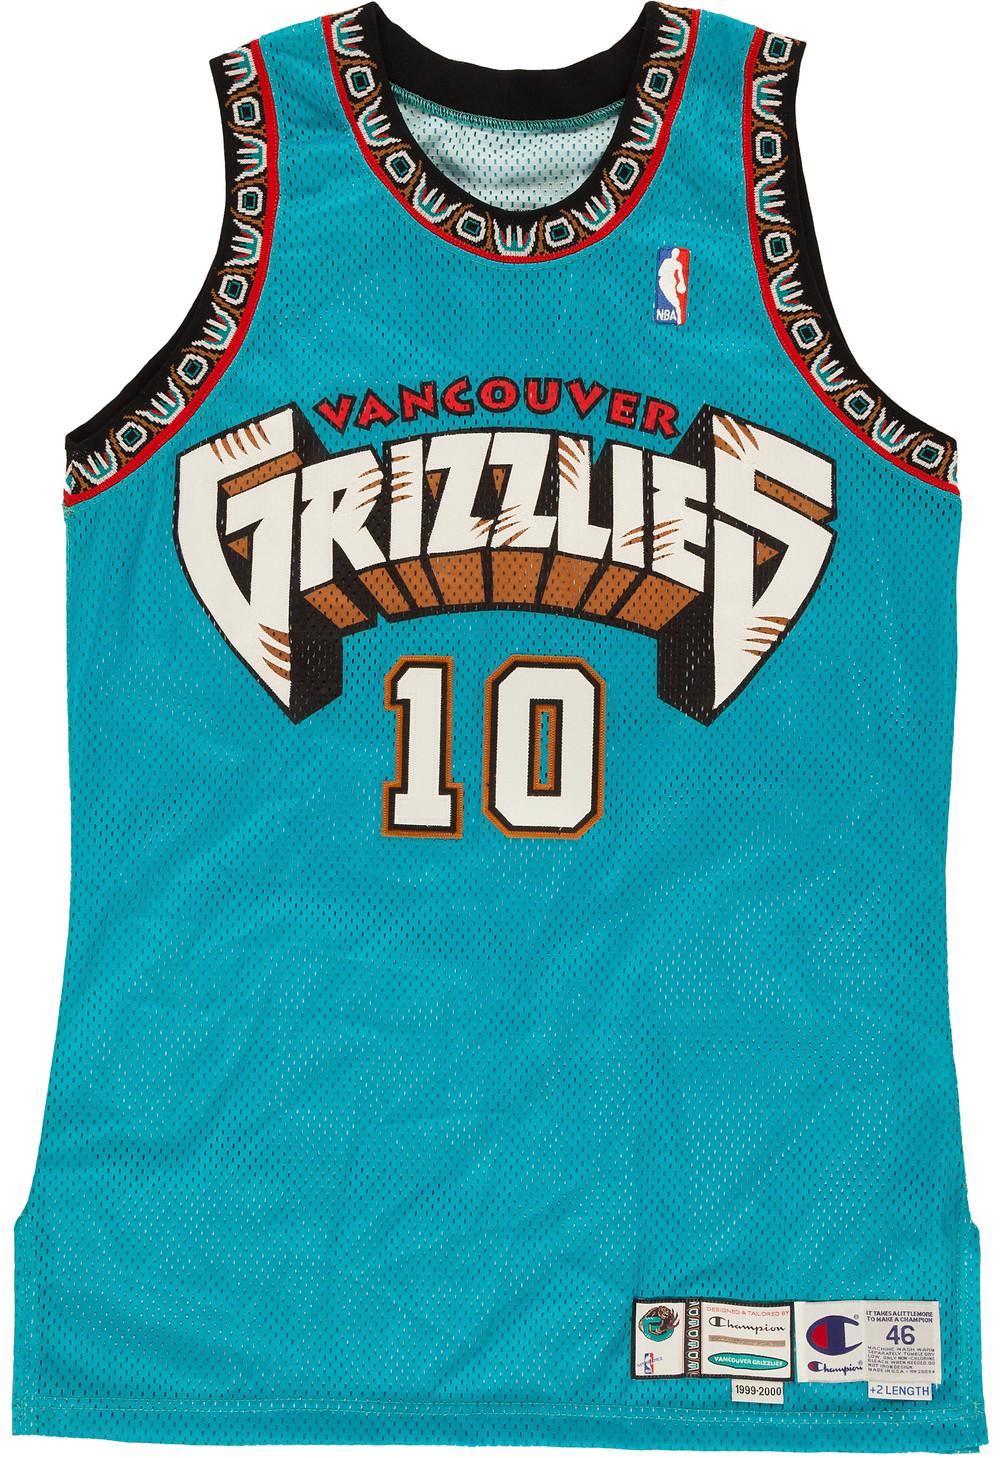 Vancouver Grizzlies Jerseys